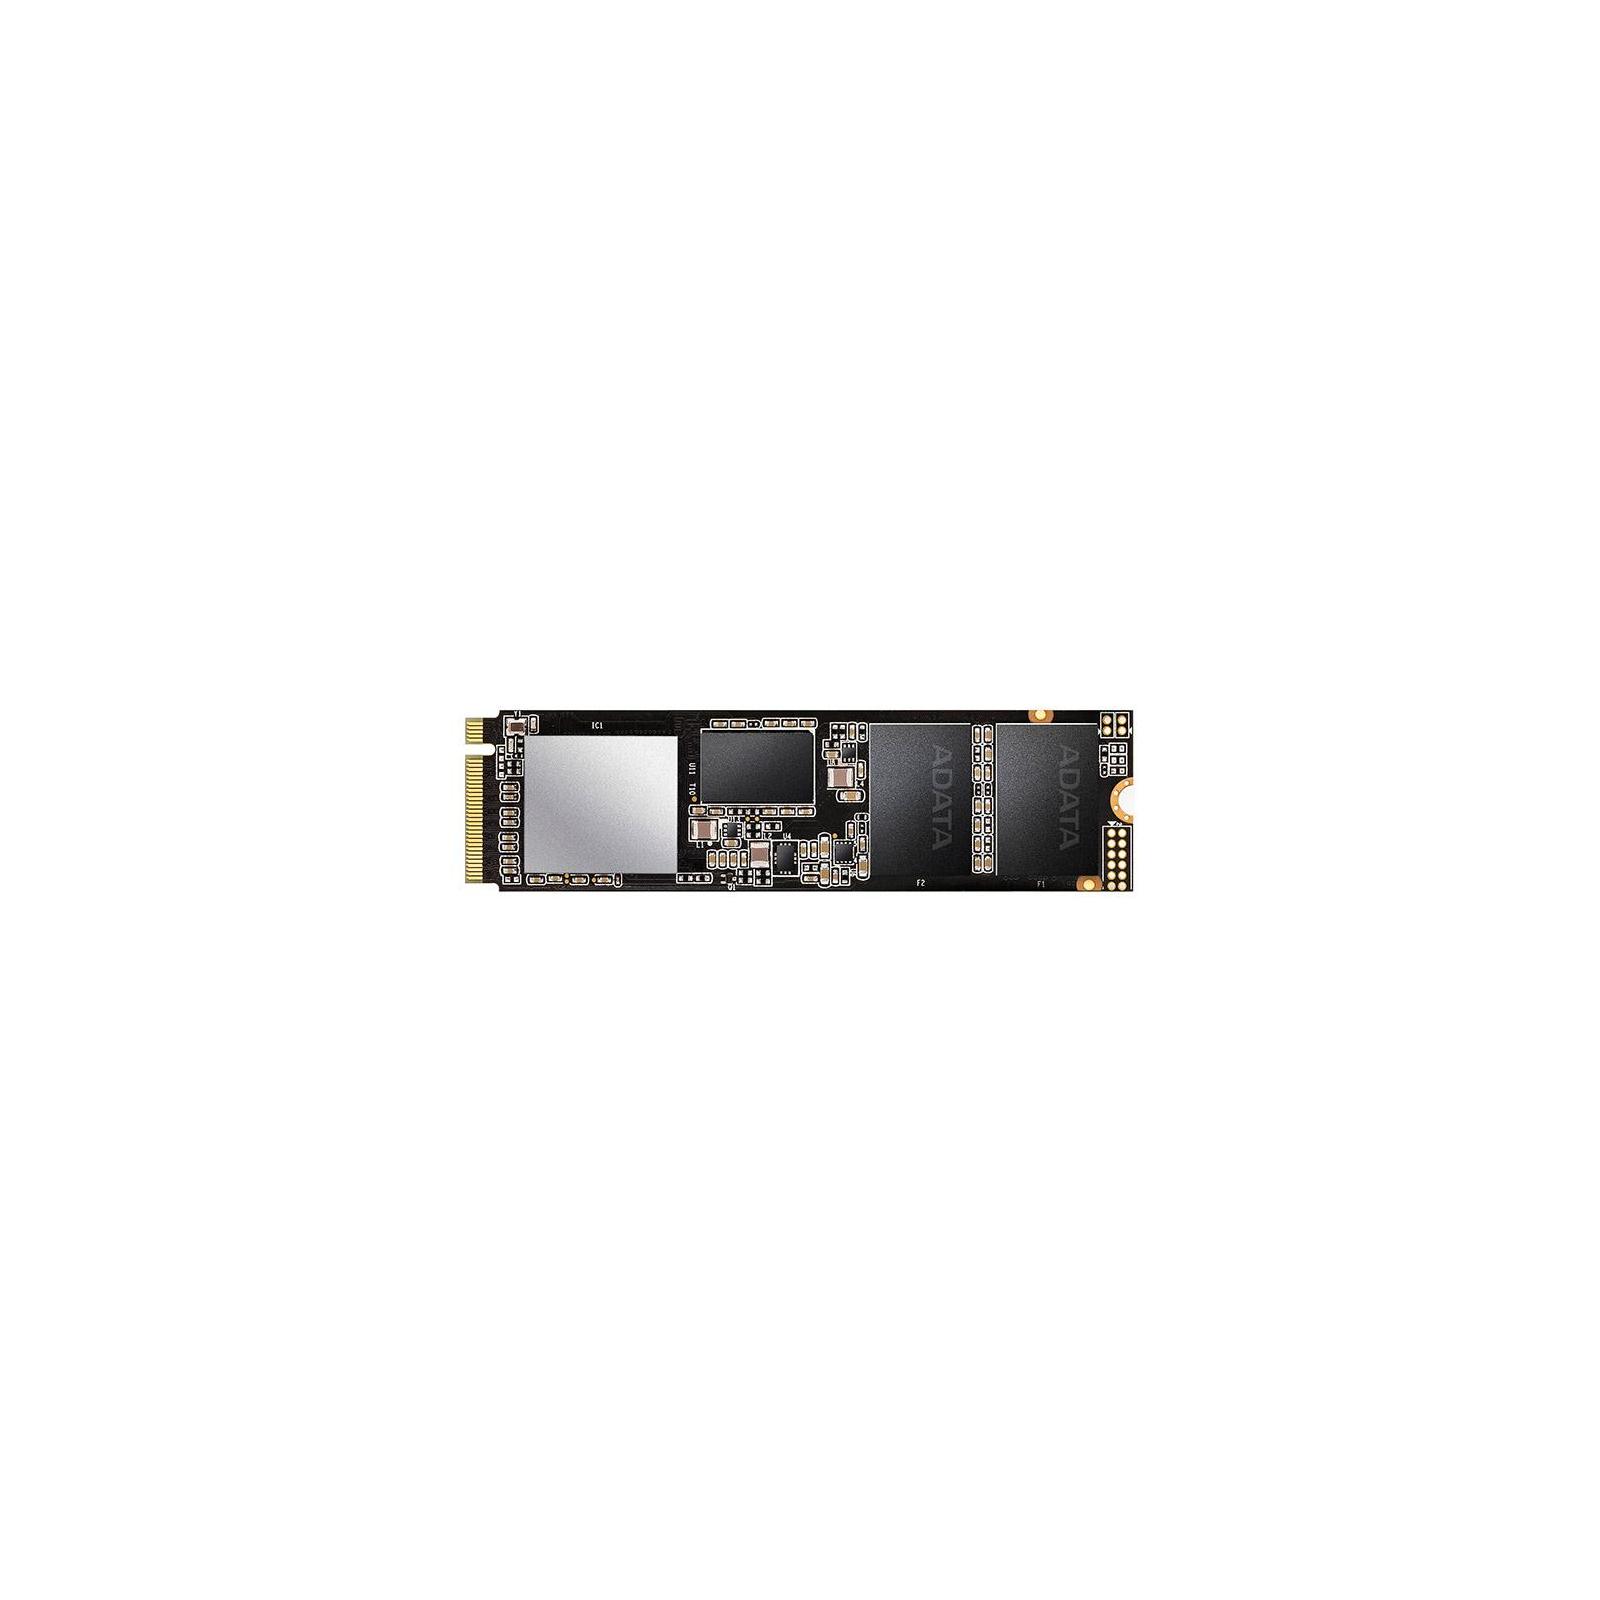 Накопитель SSD M.2 2280 480GB ADATA (ASX8200NP-480GT-C)